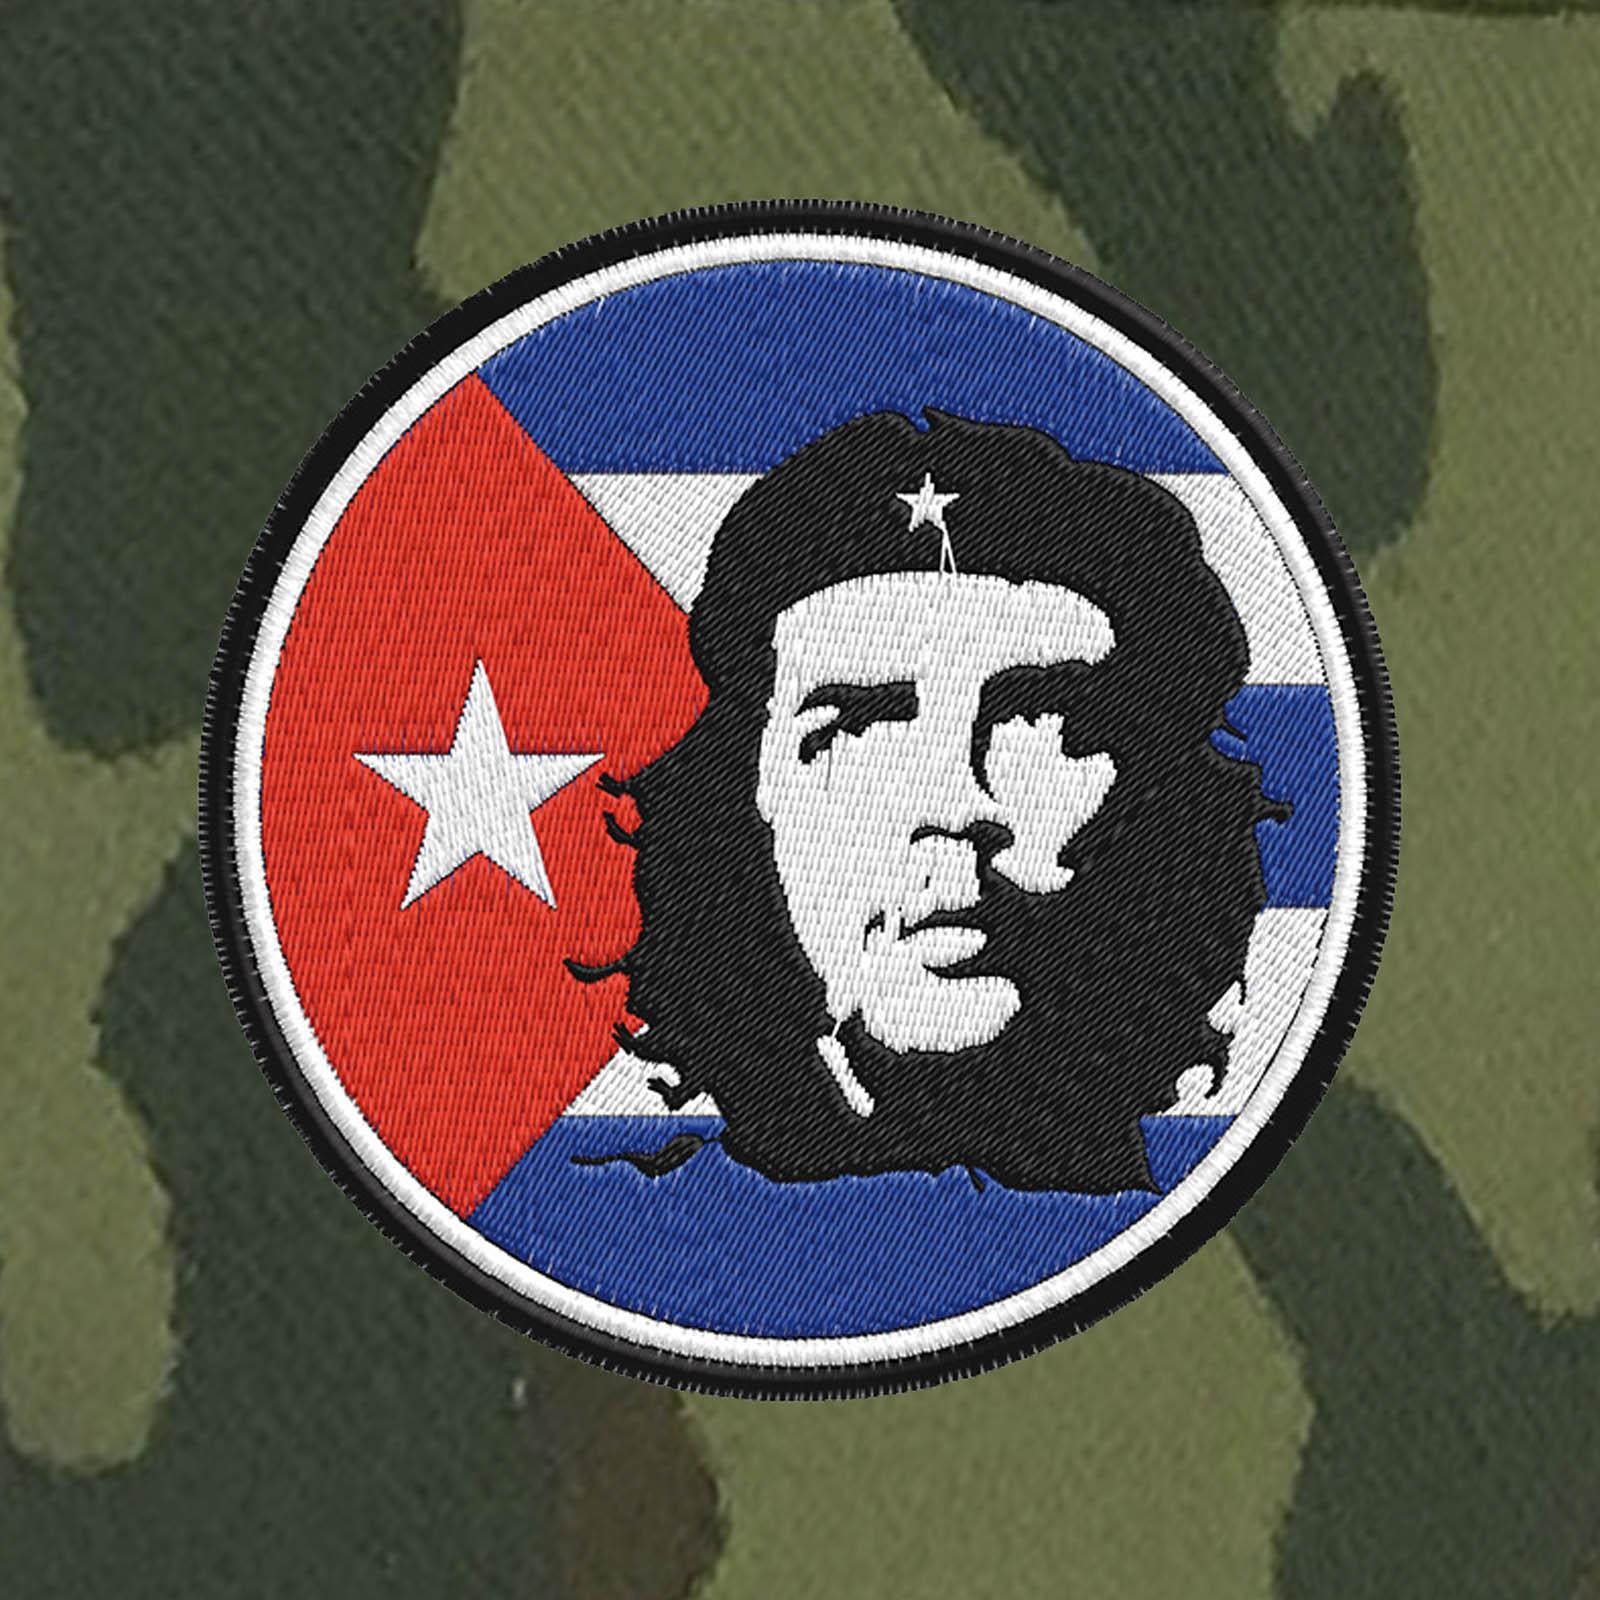 Милитари кепка с шевроном Че Гевары.